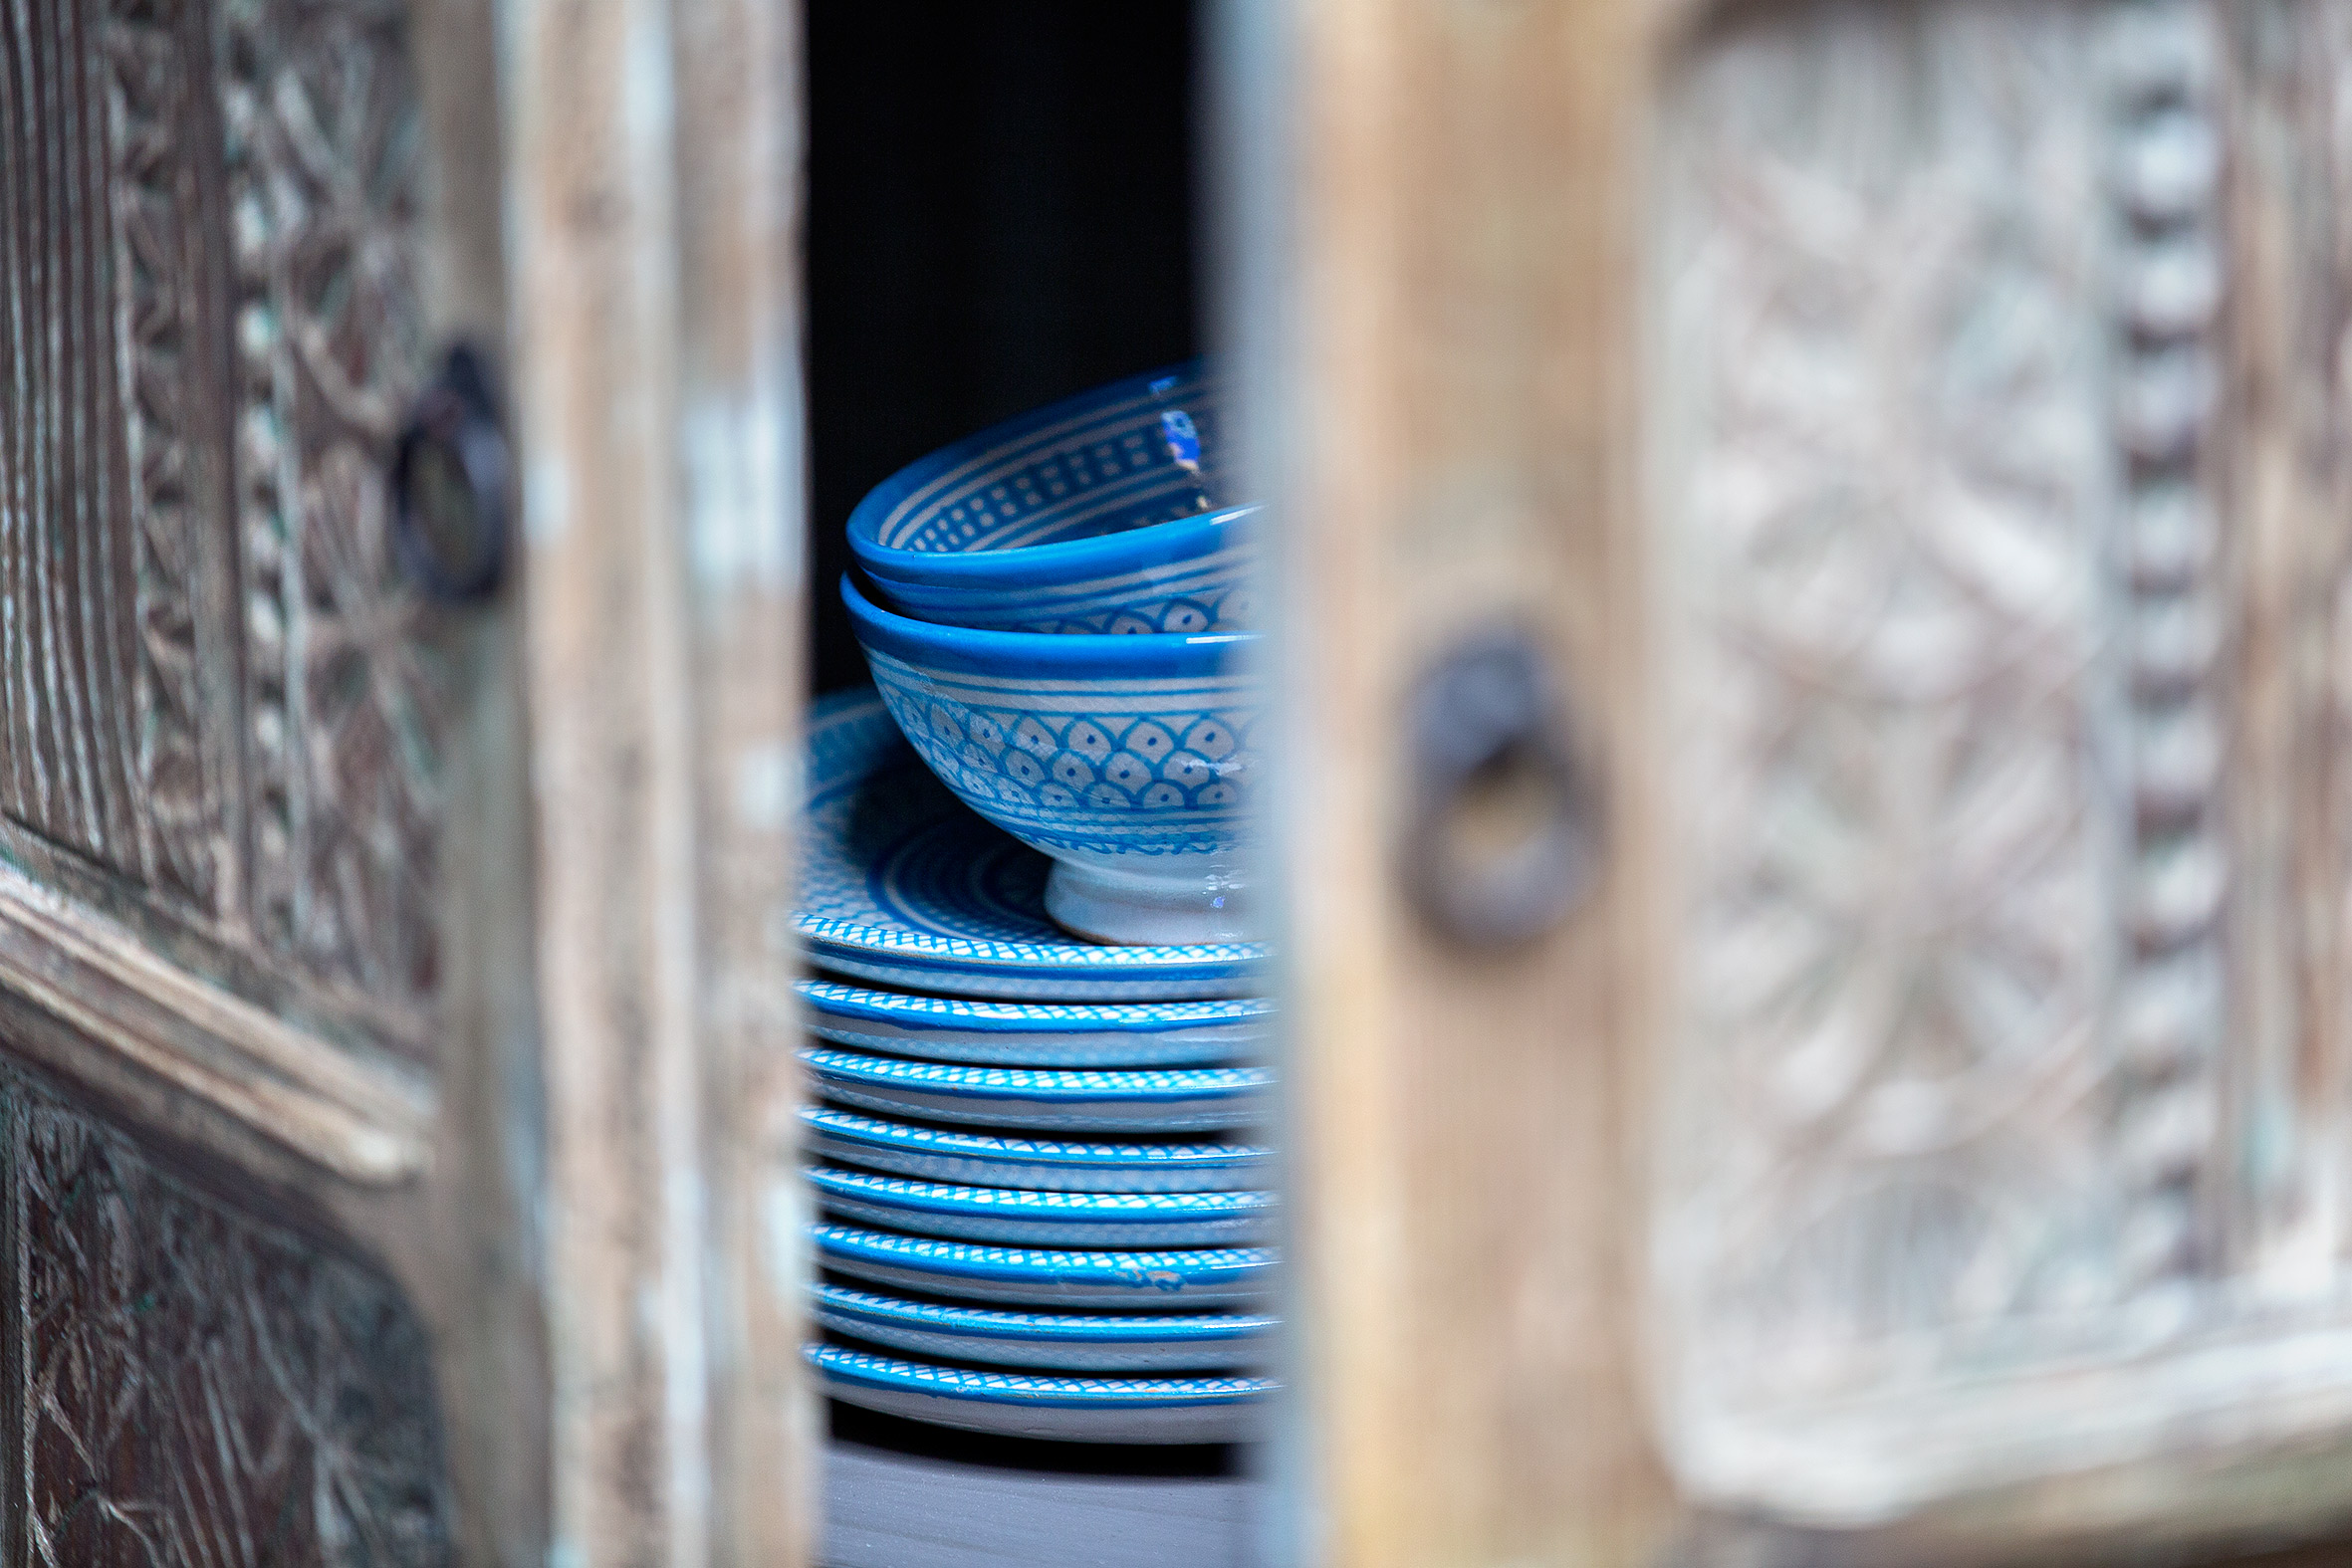 Oriental-Design-House-Zuerich-Produktefotograf-Luca-Rueedi.jpg